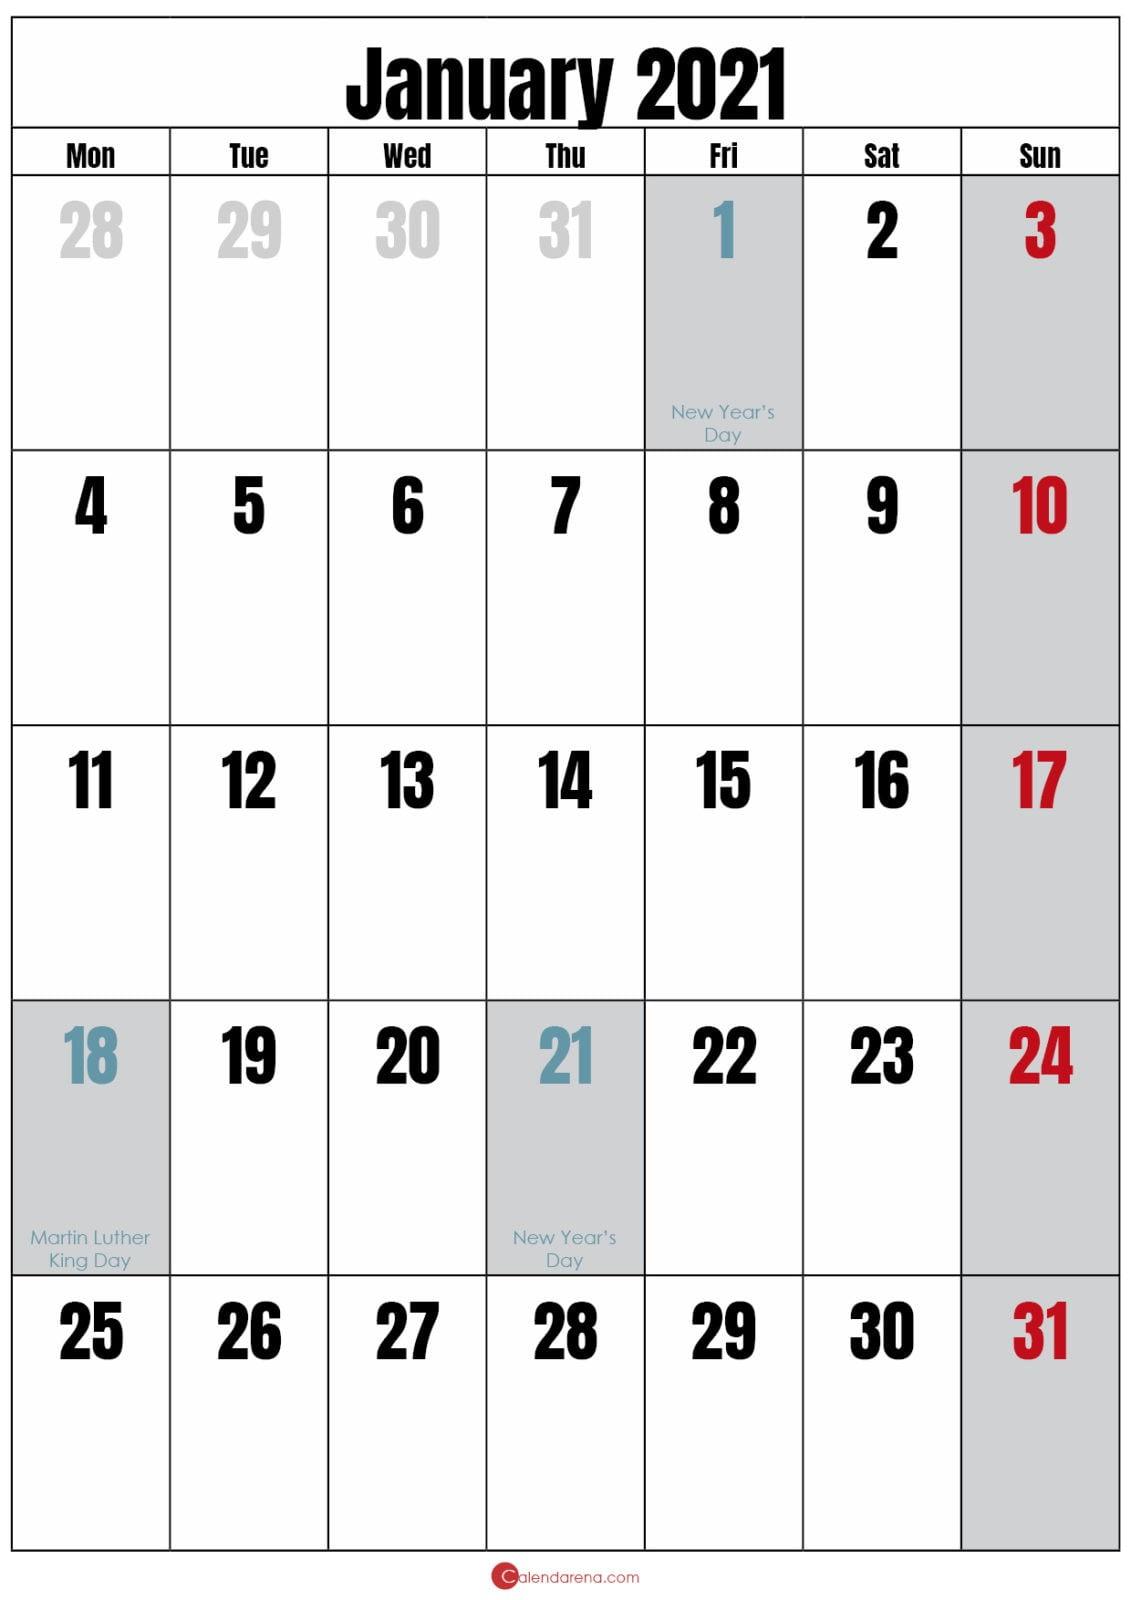 Download Calendar January 2021 - January 2021 Calendar ...